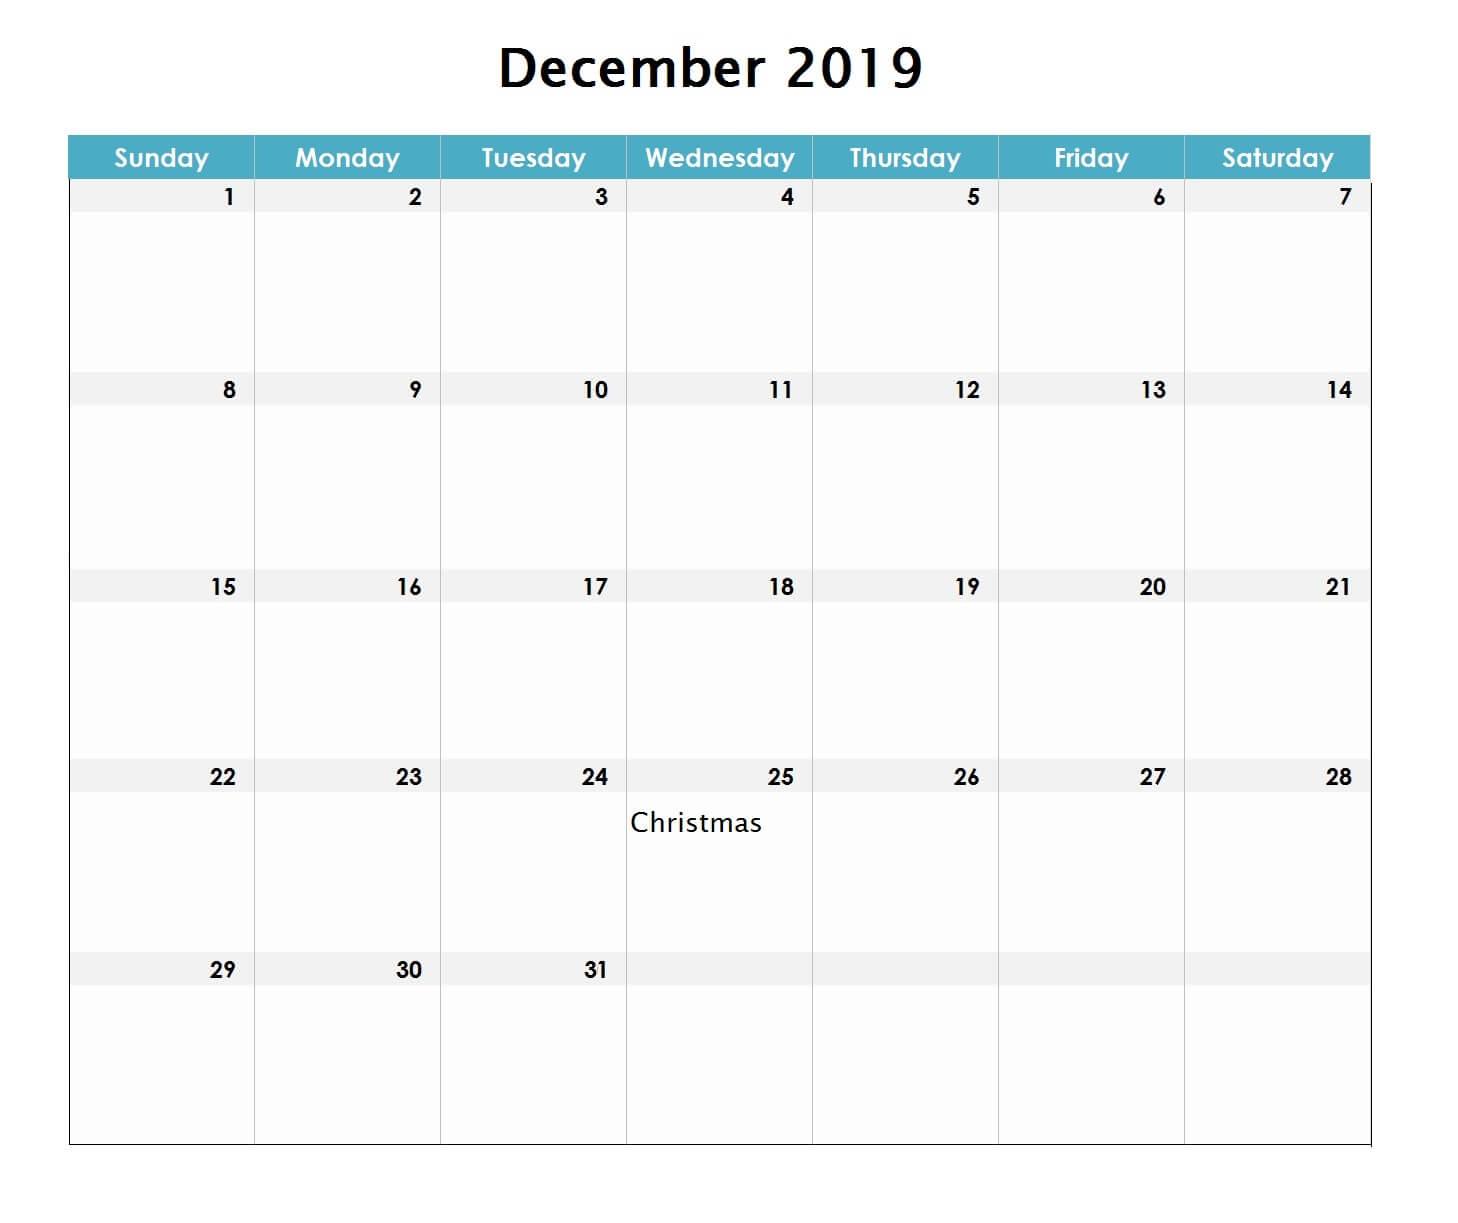 December 2019 Excel Calendar